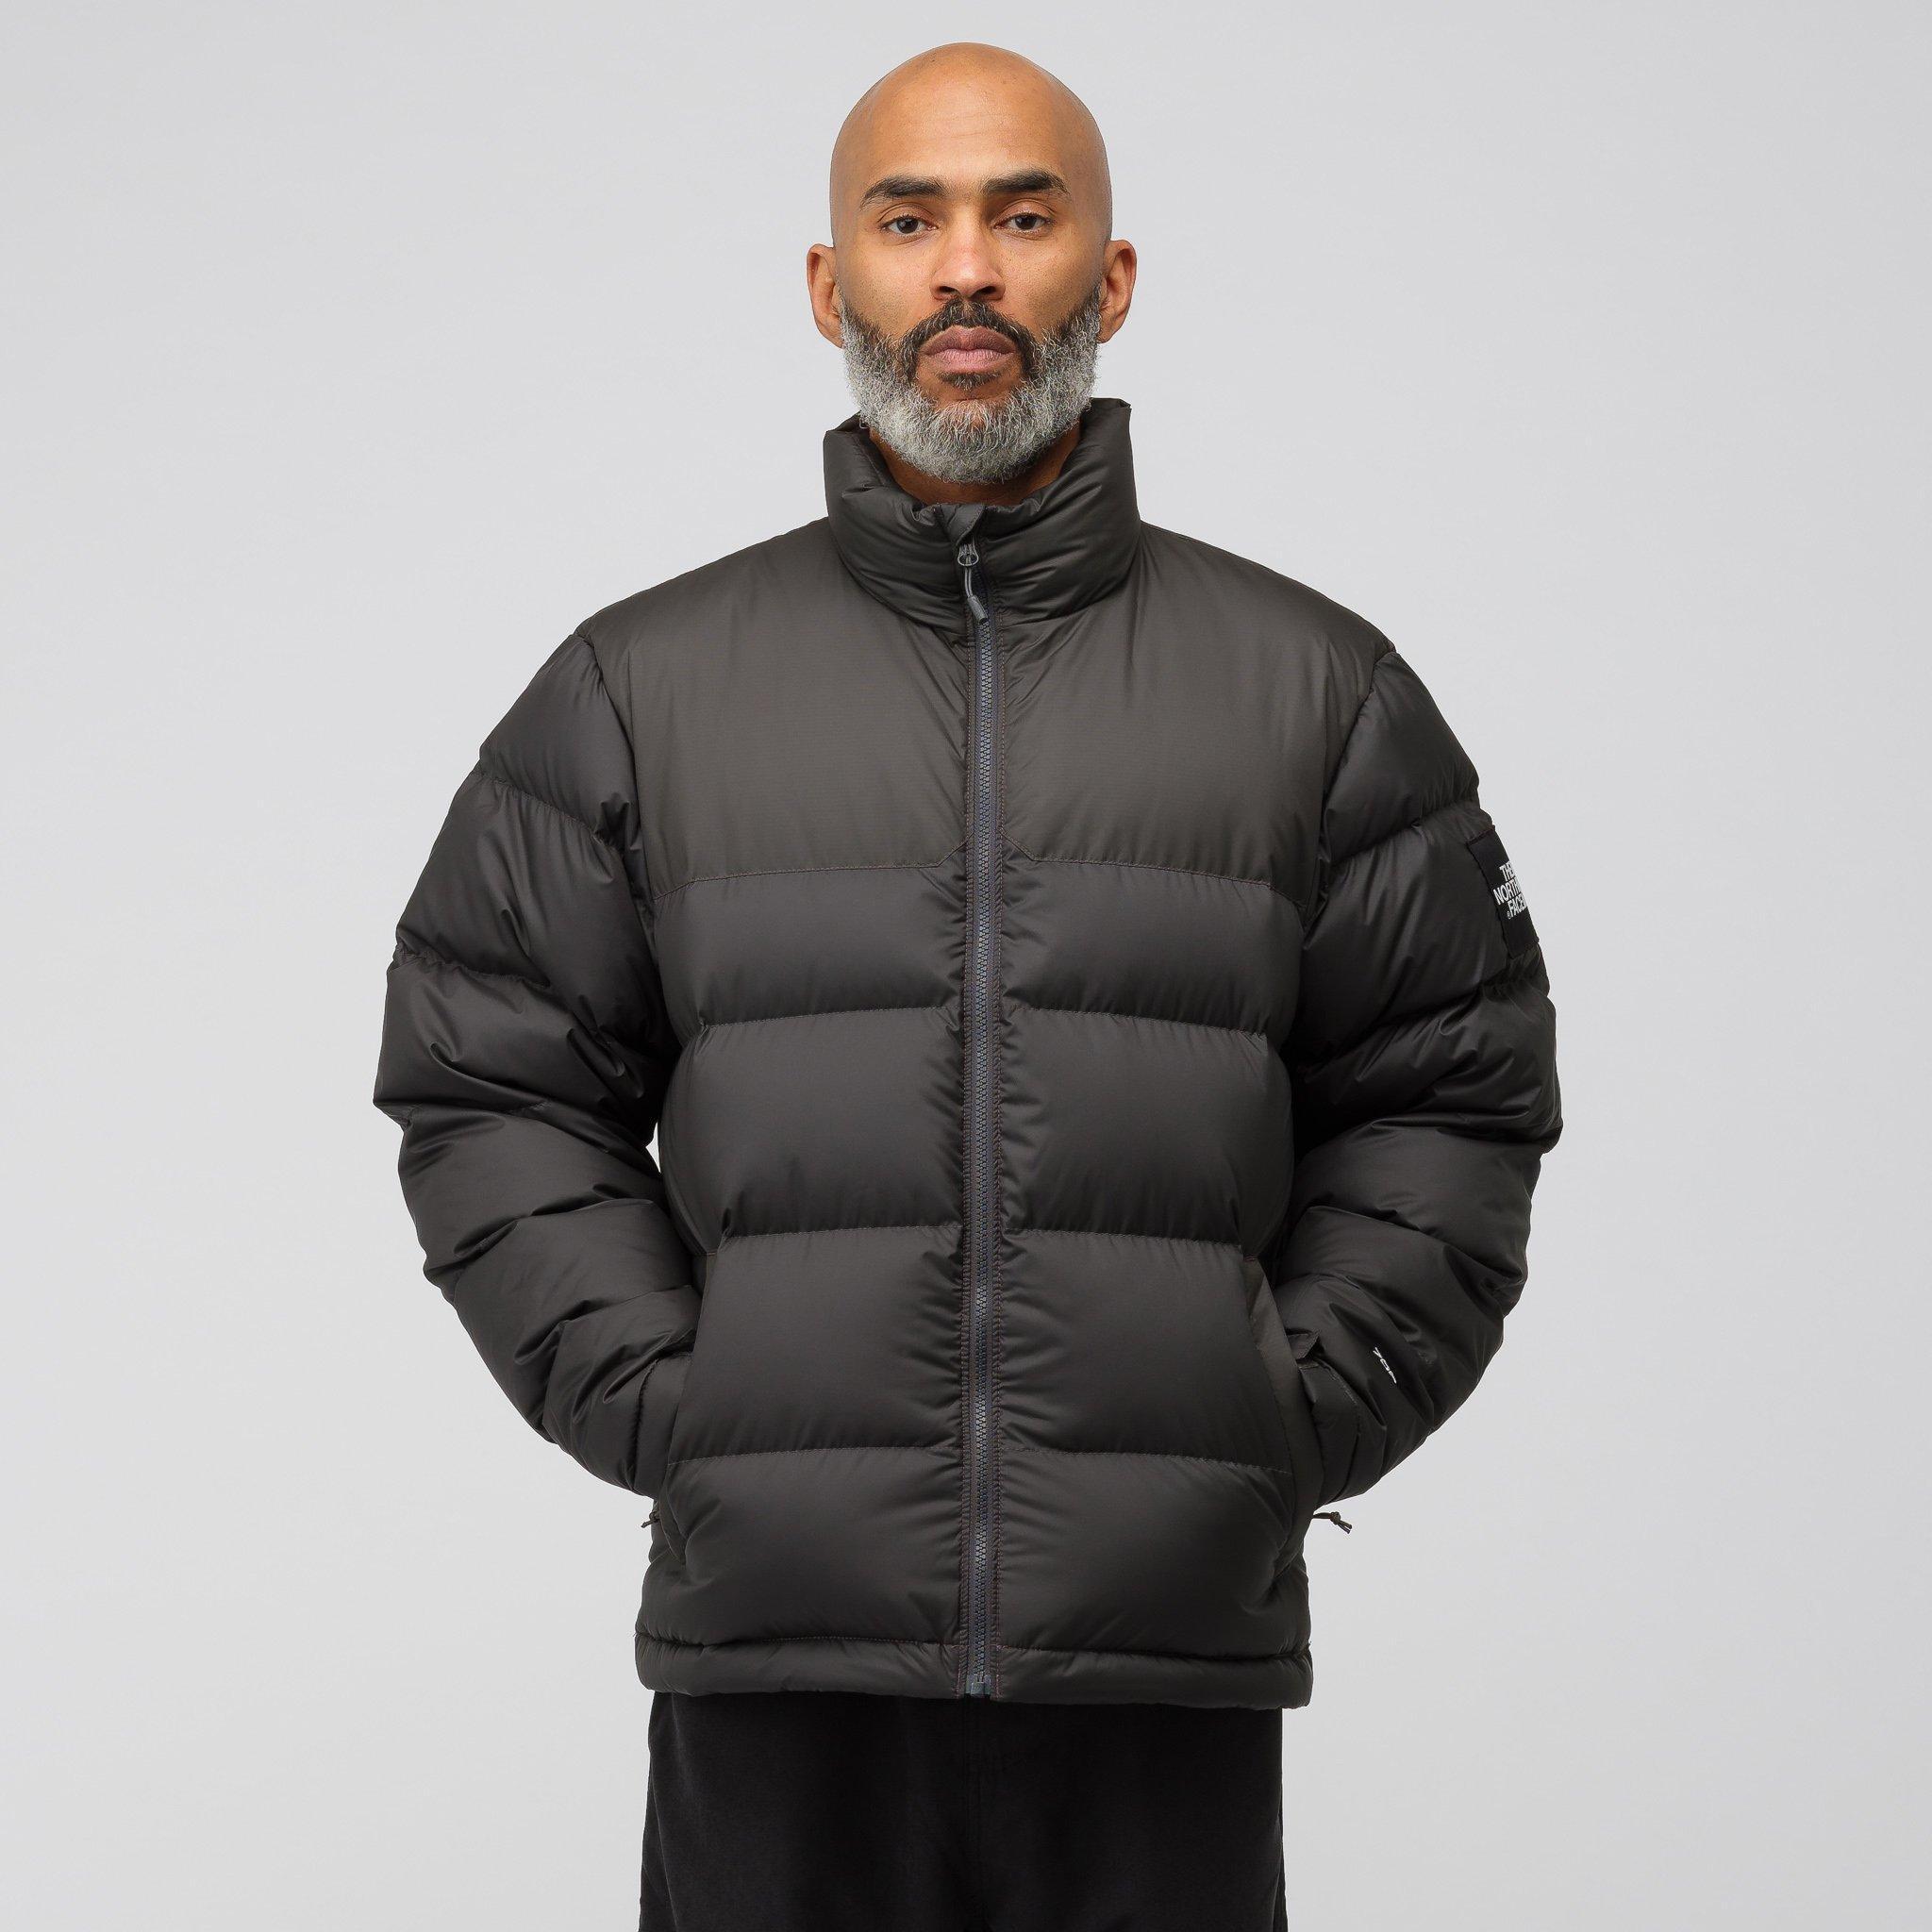 9997db823 The North Face Gray 92 Nuptse Jacket In Asphalt Grey for men